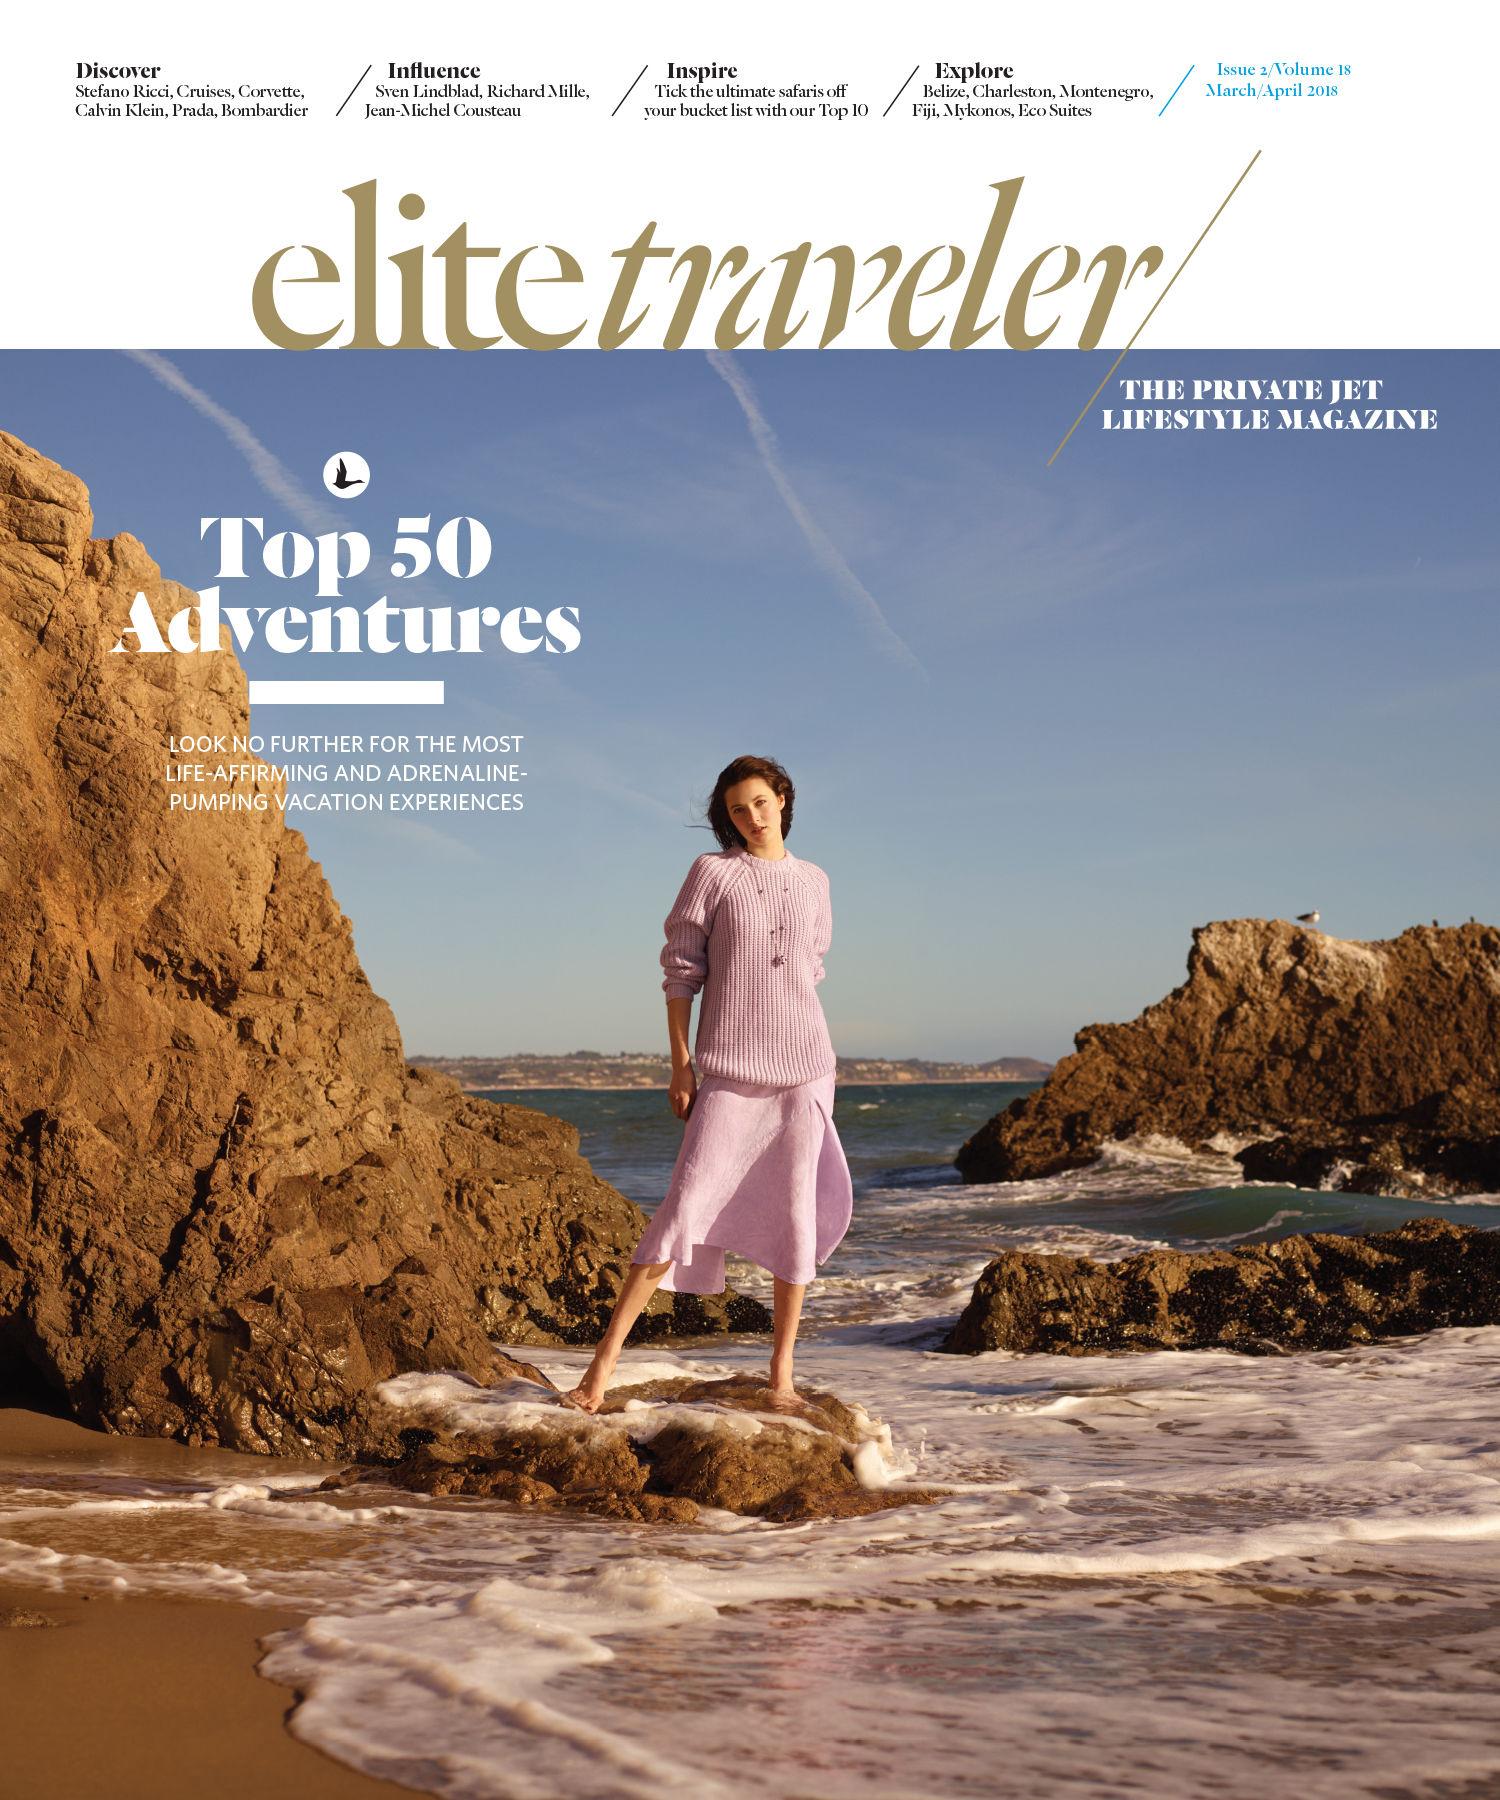 GlamPR produces Elite Traveler Magazine cover and inside spread